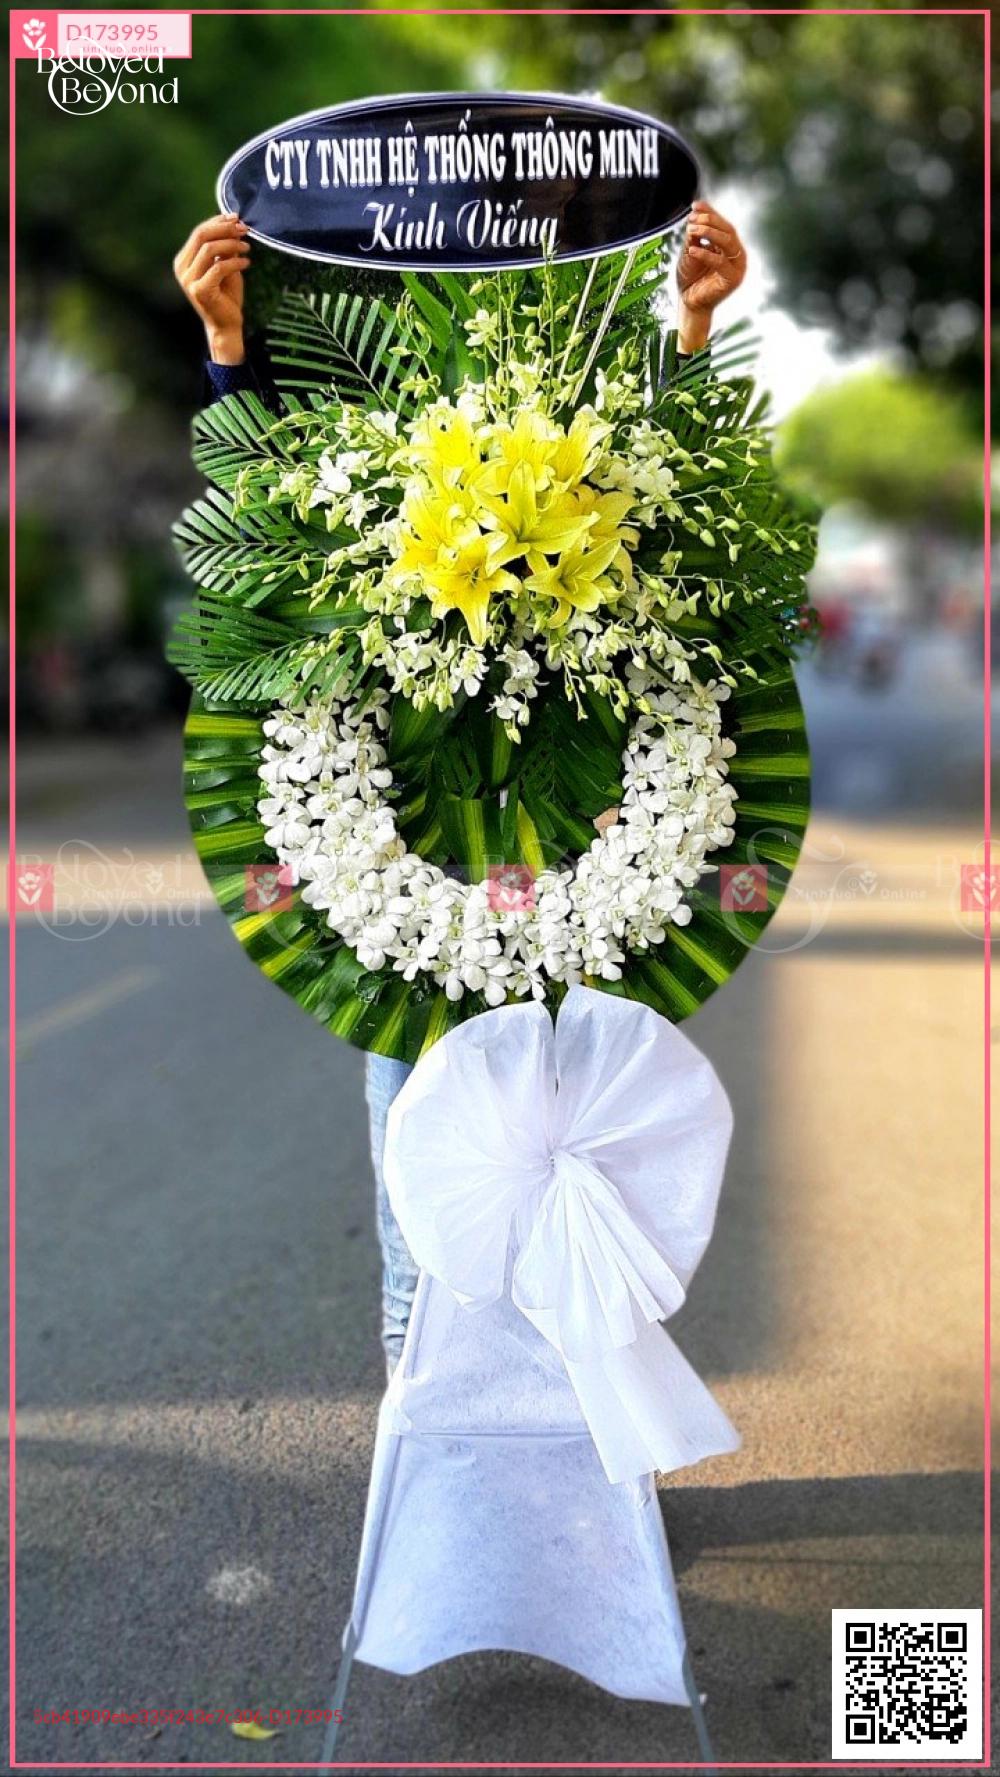 Kính viếng - D173995 - xinhtuoi.online